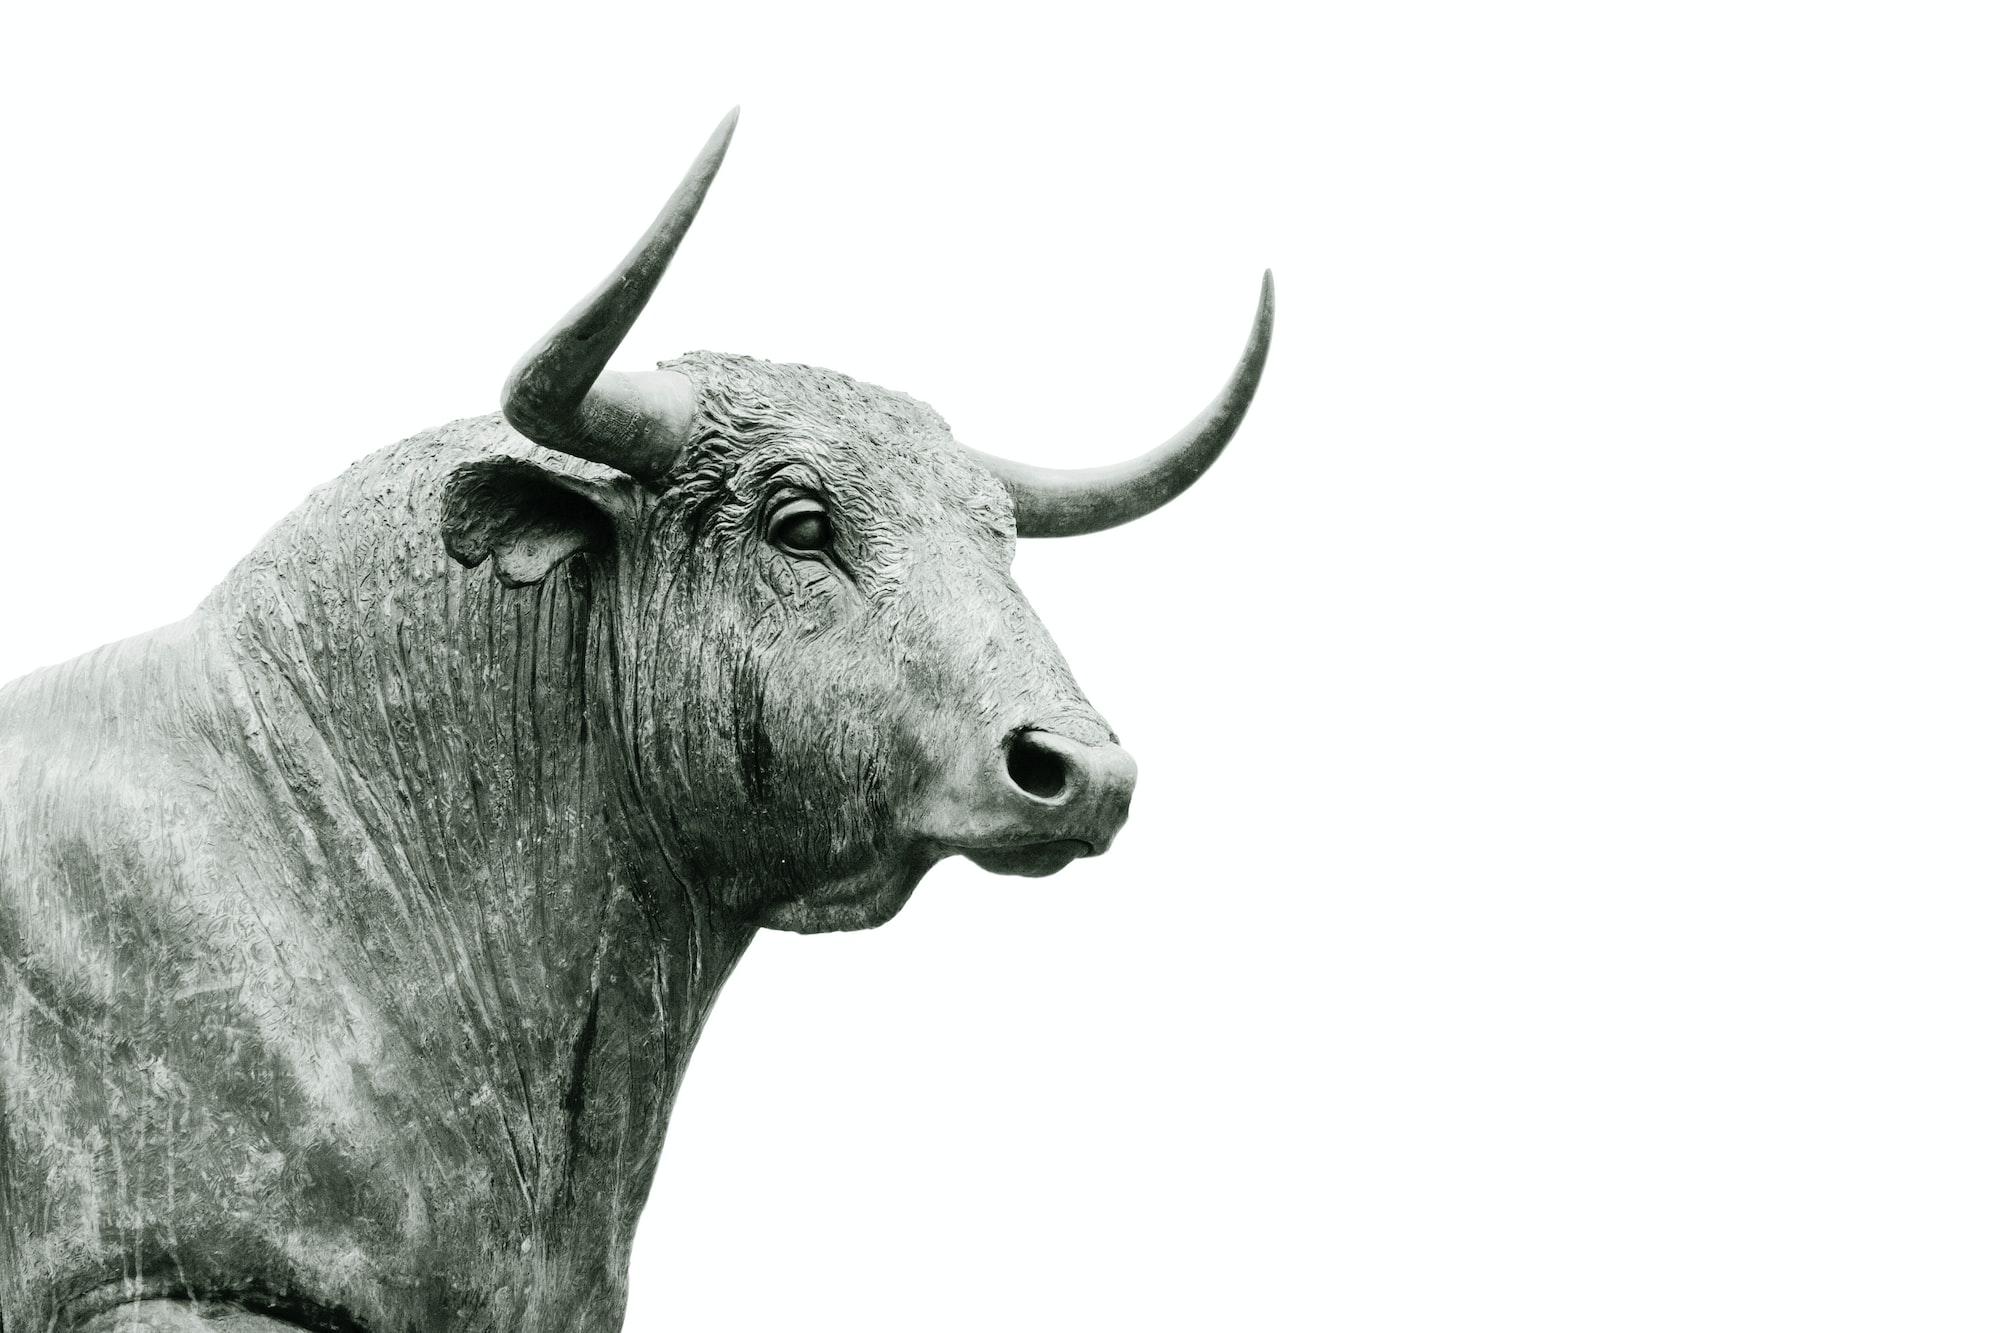 Bullish week for U.S, Singapore, HK. Weekly market observation 15Oct2021